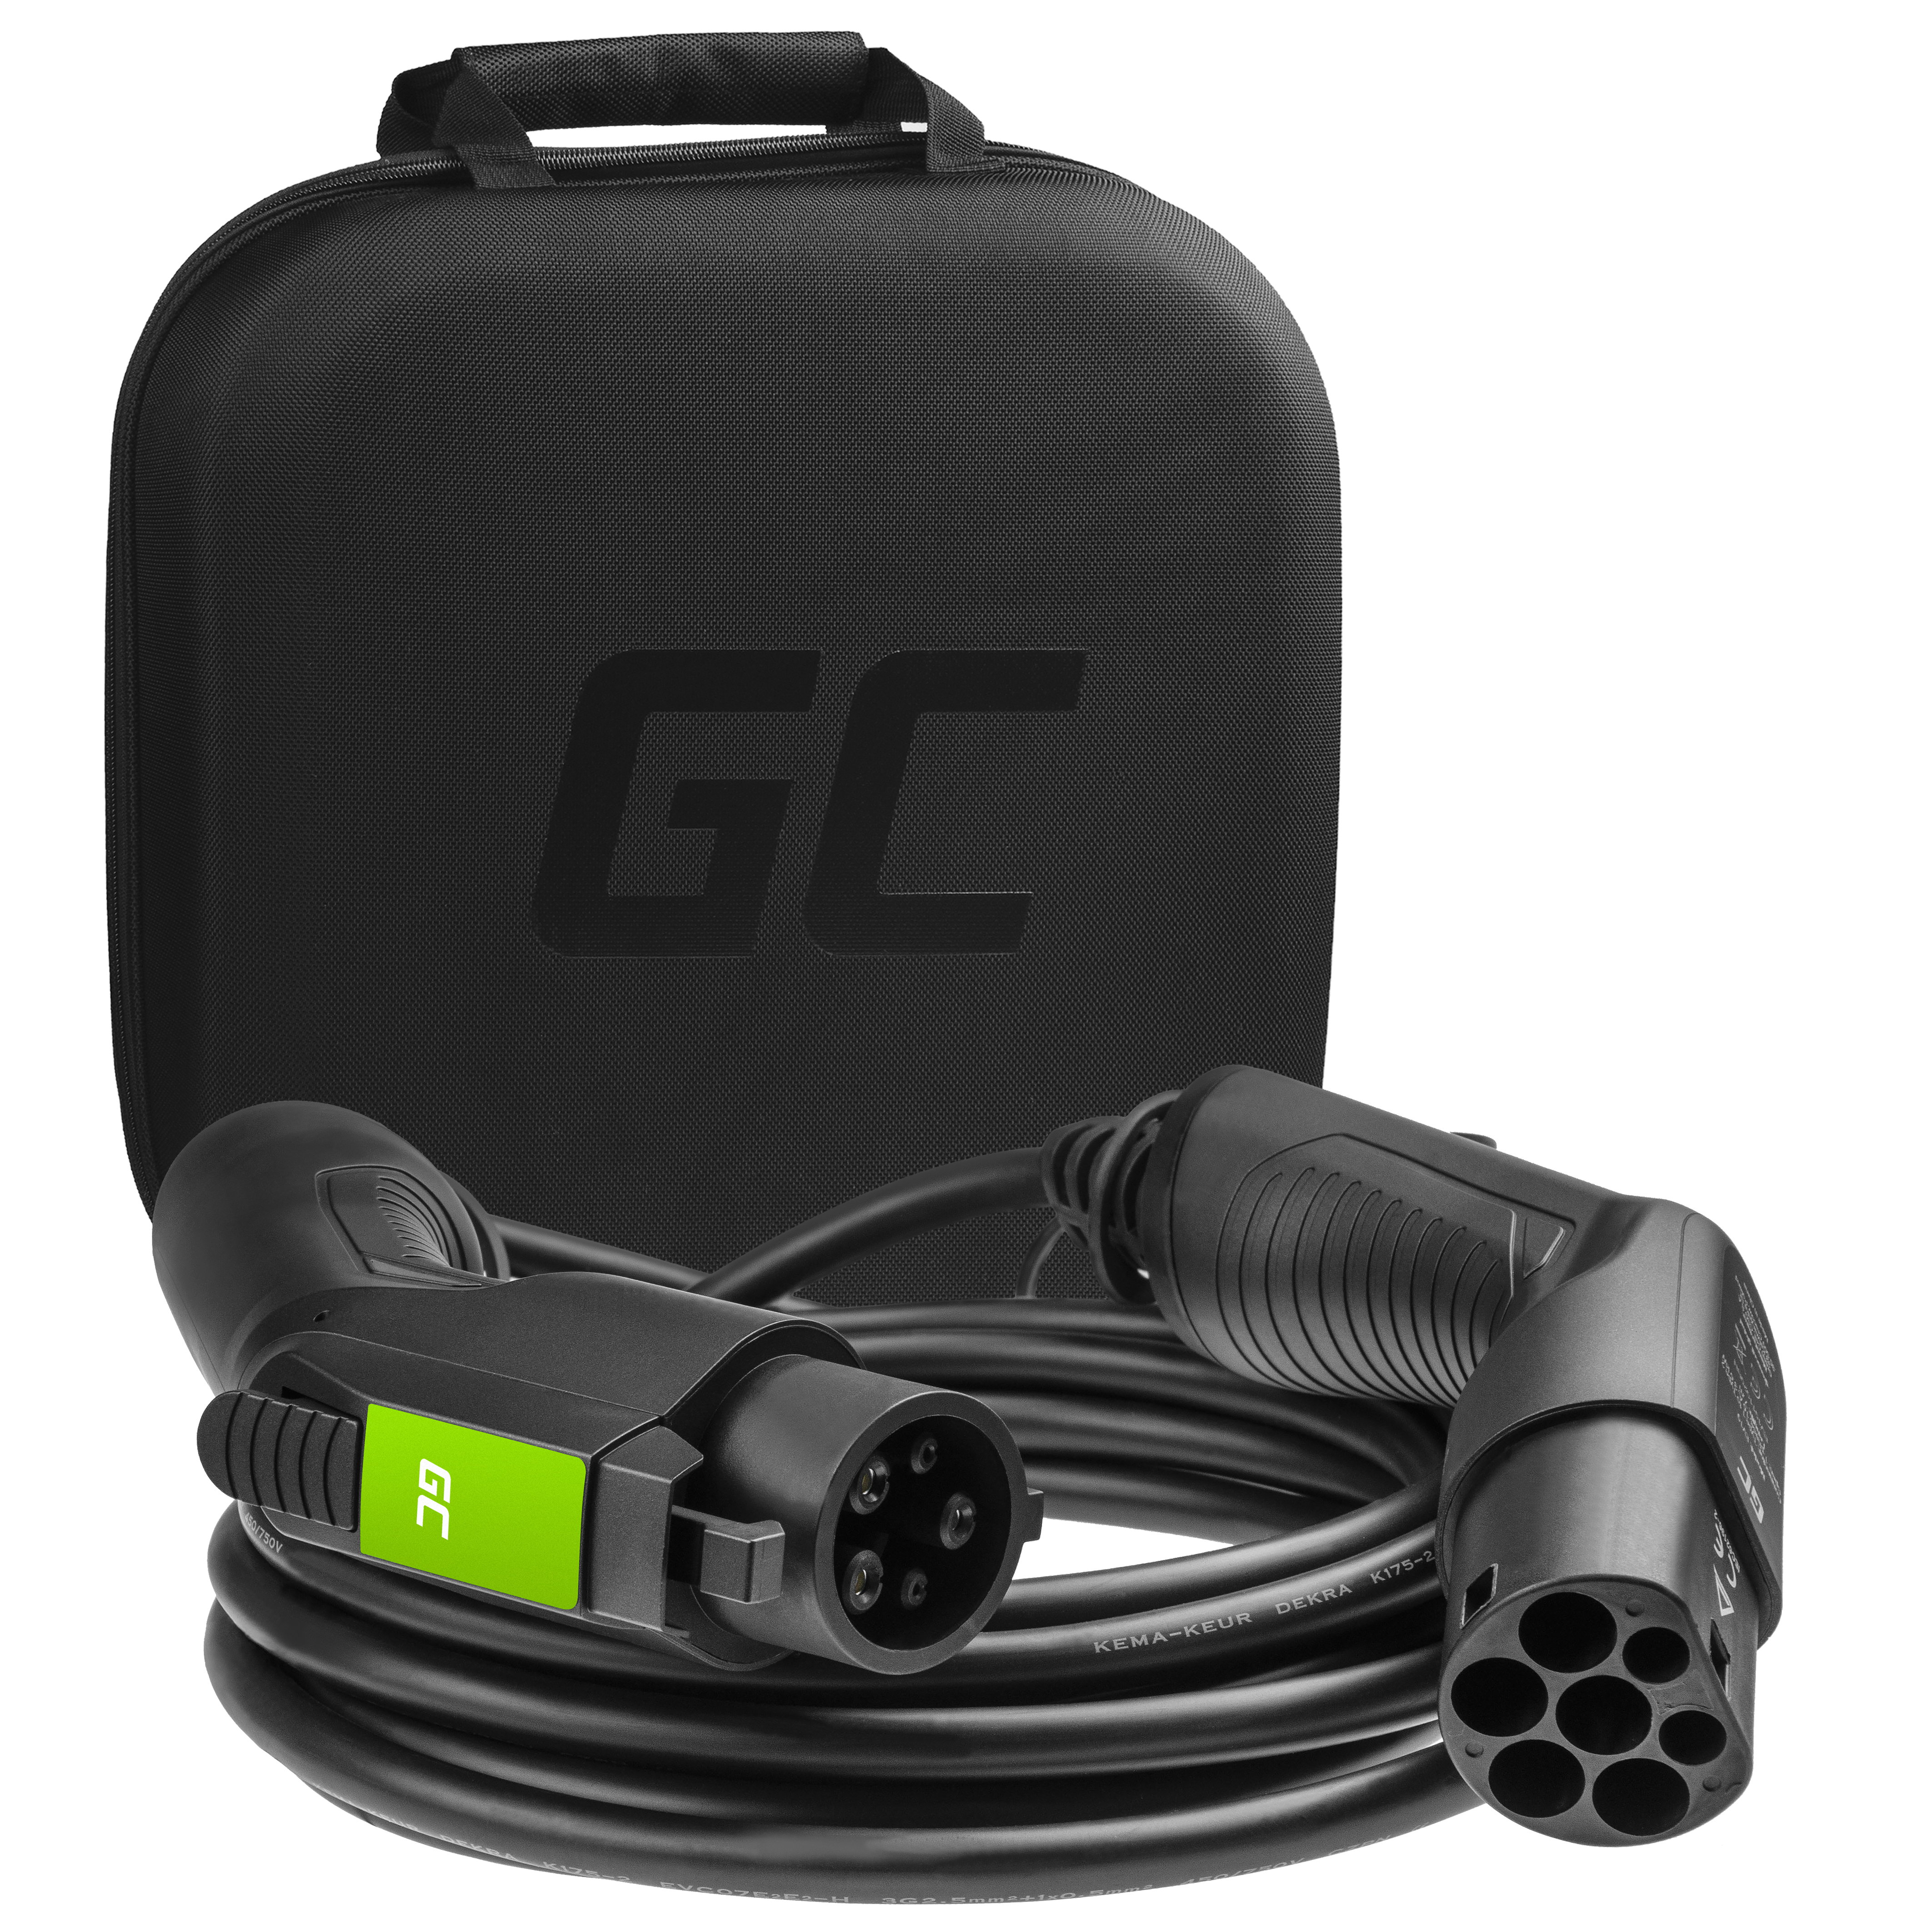 Kabel GC Typ 1 3.6kW 16A 7m för laddning EV